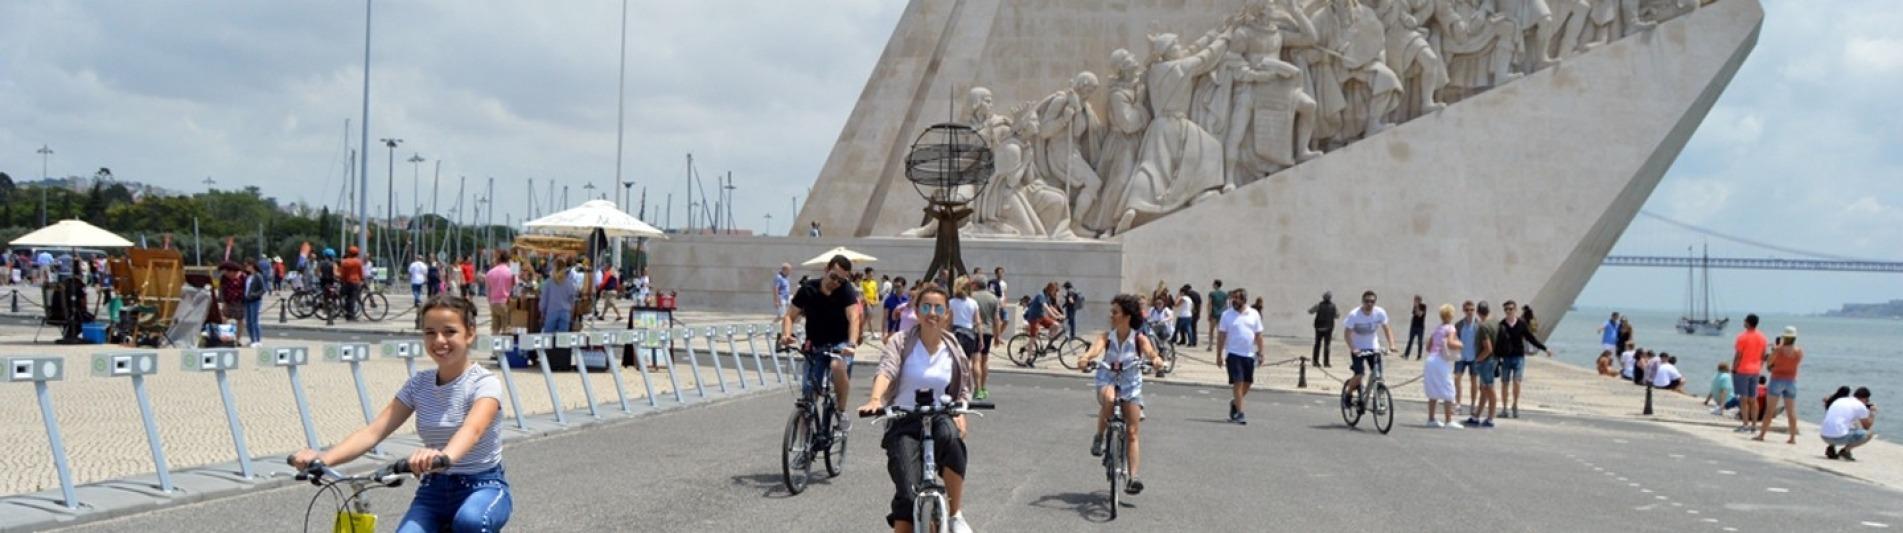 free-bike-tour-lisbon-capa-site-belem-3